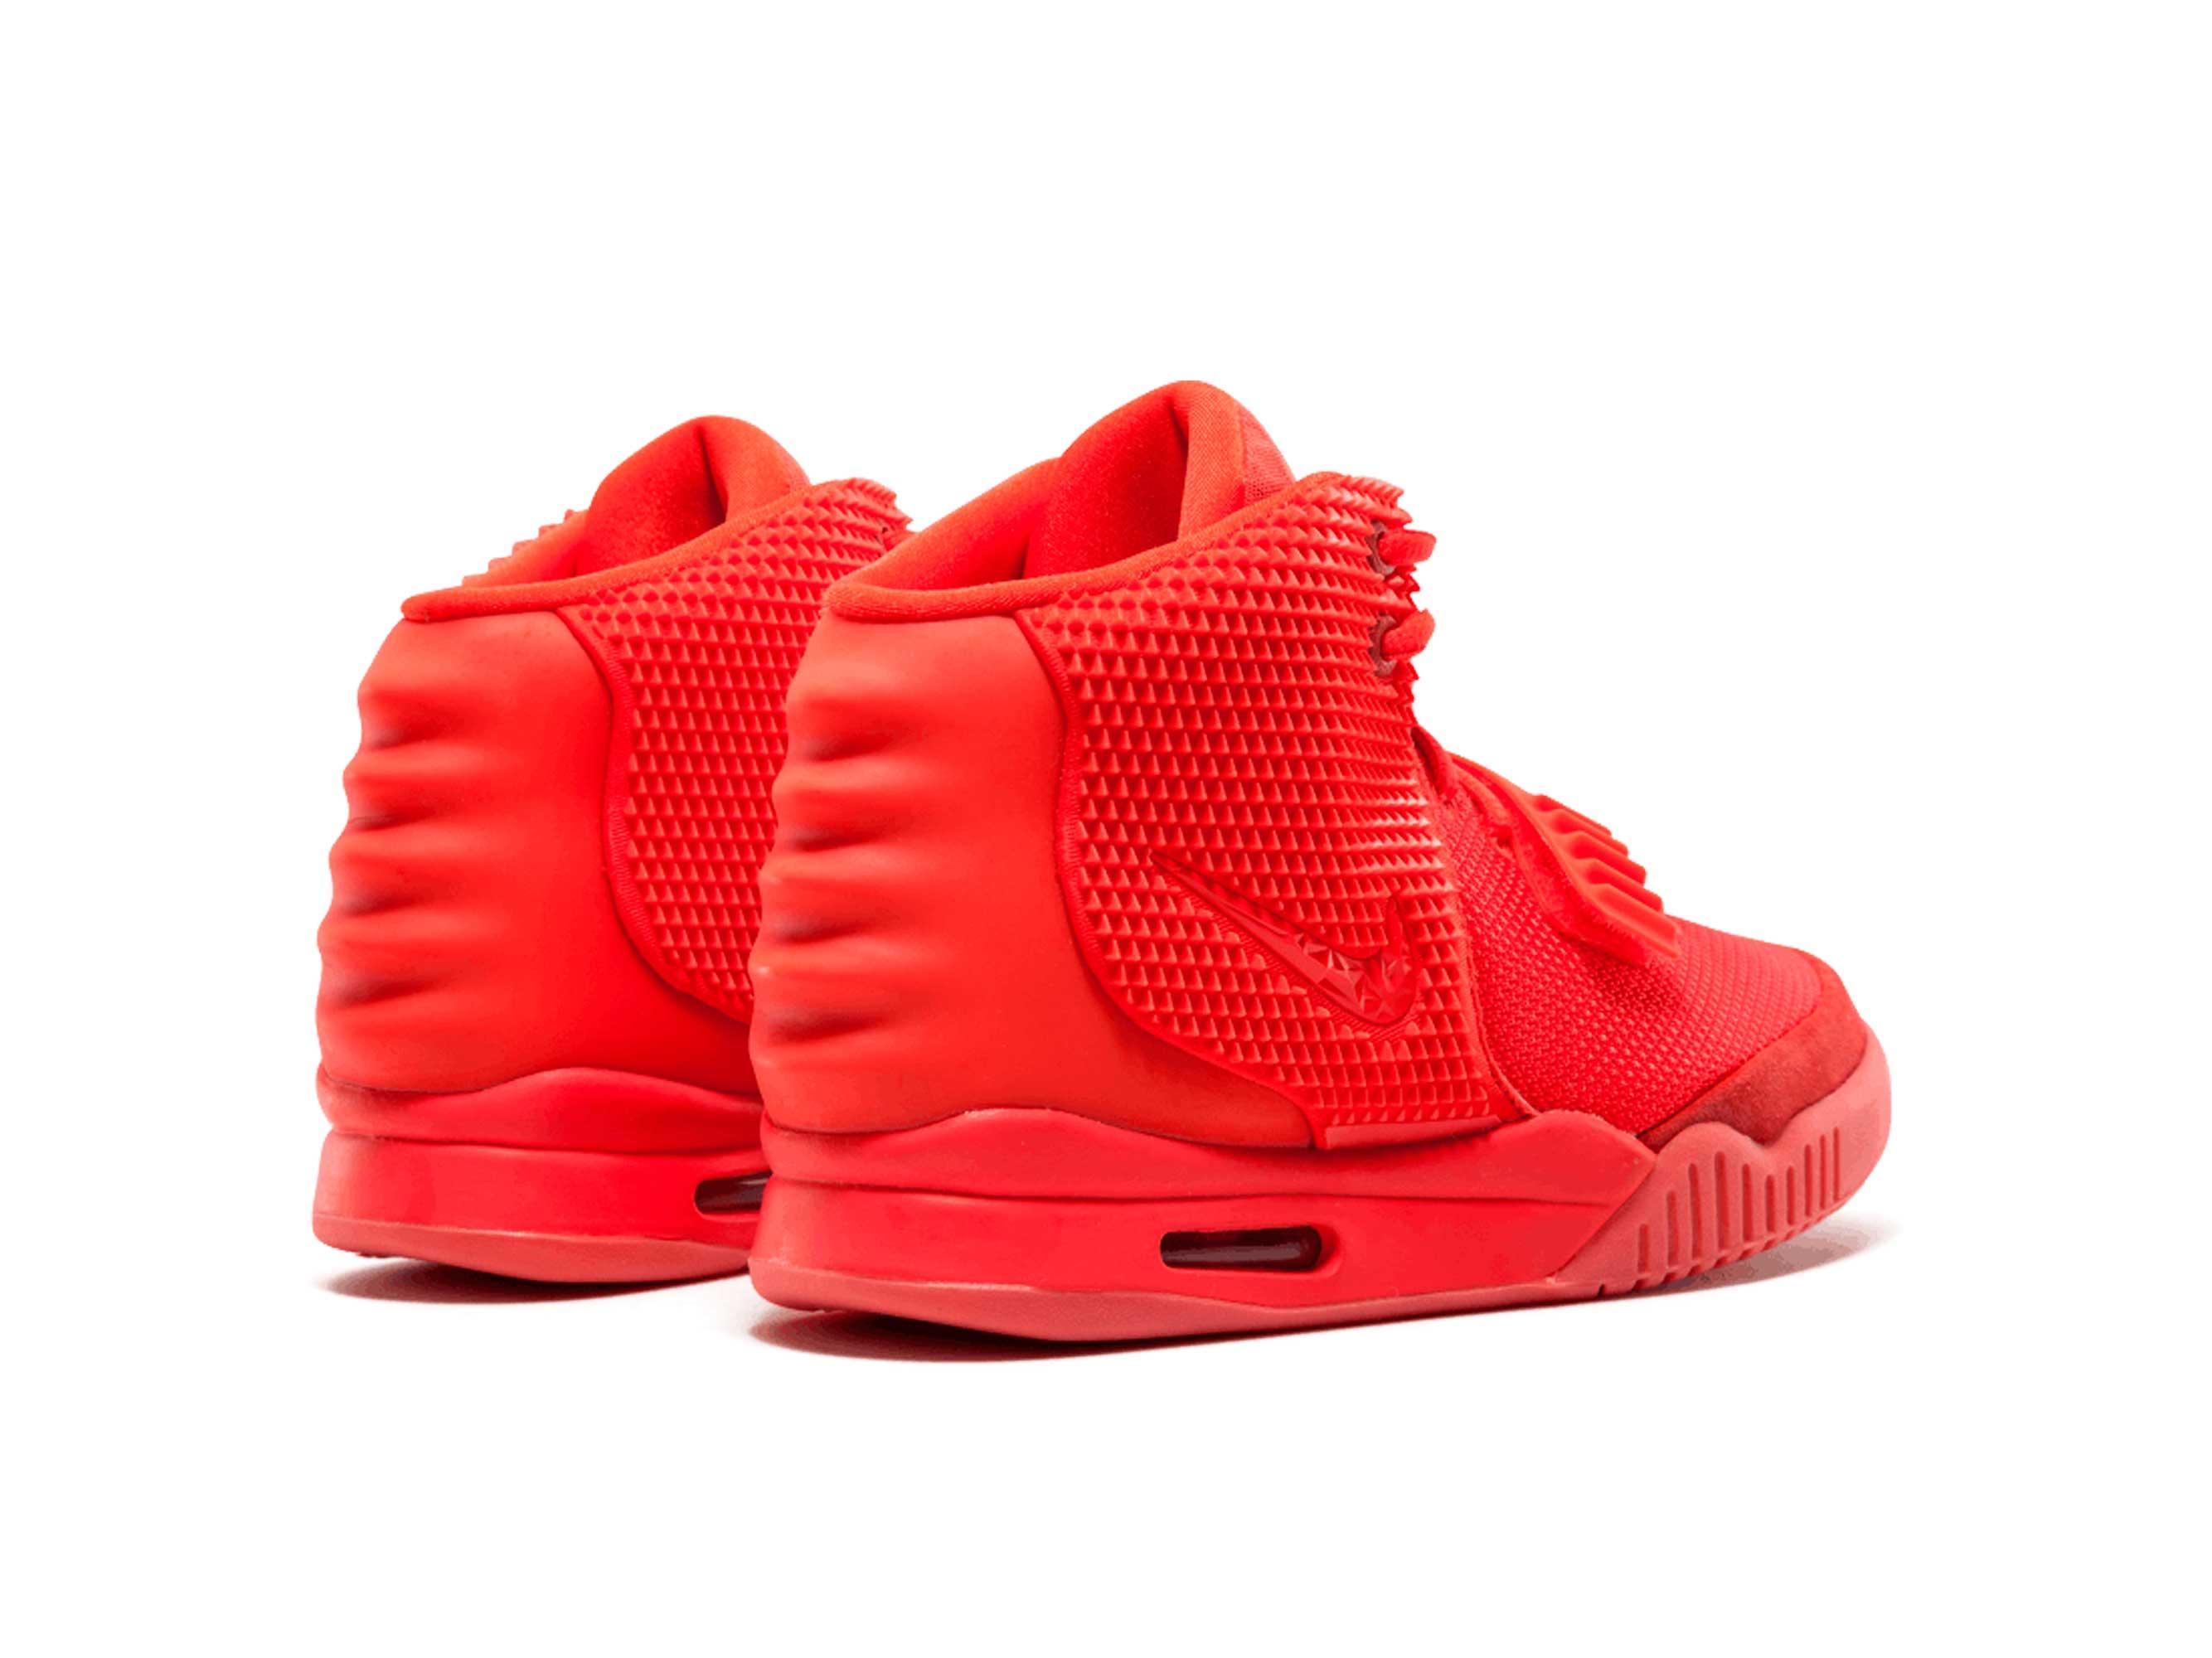 nike air yeezy 2 sp red october ⋆ Nike